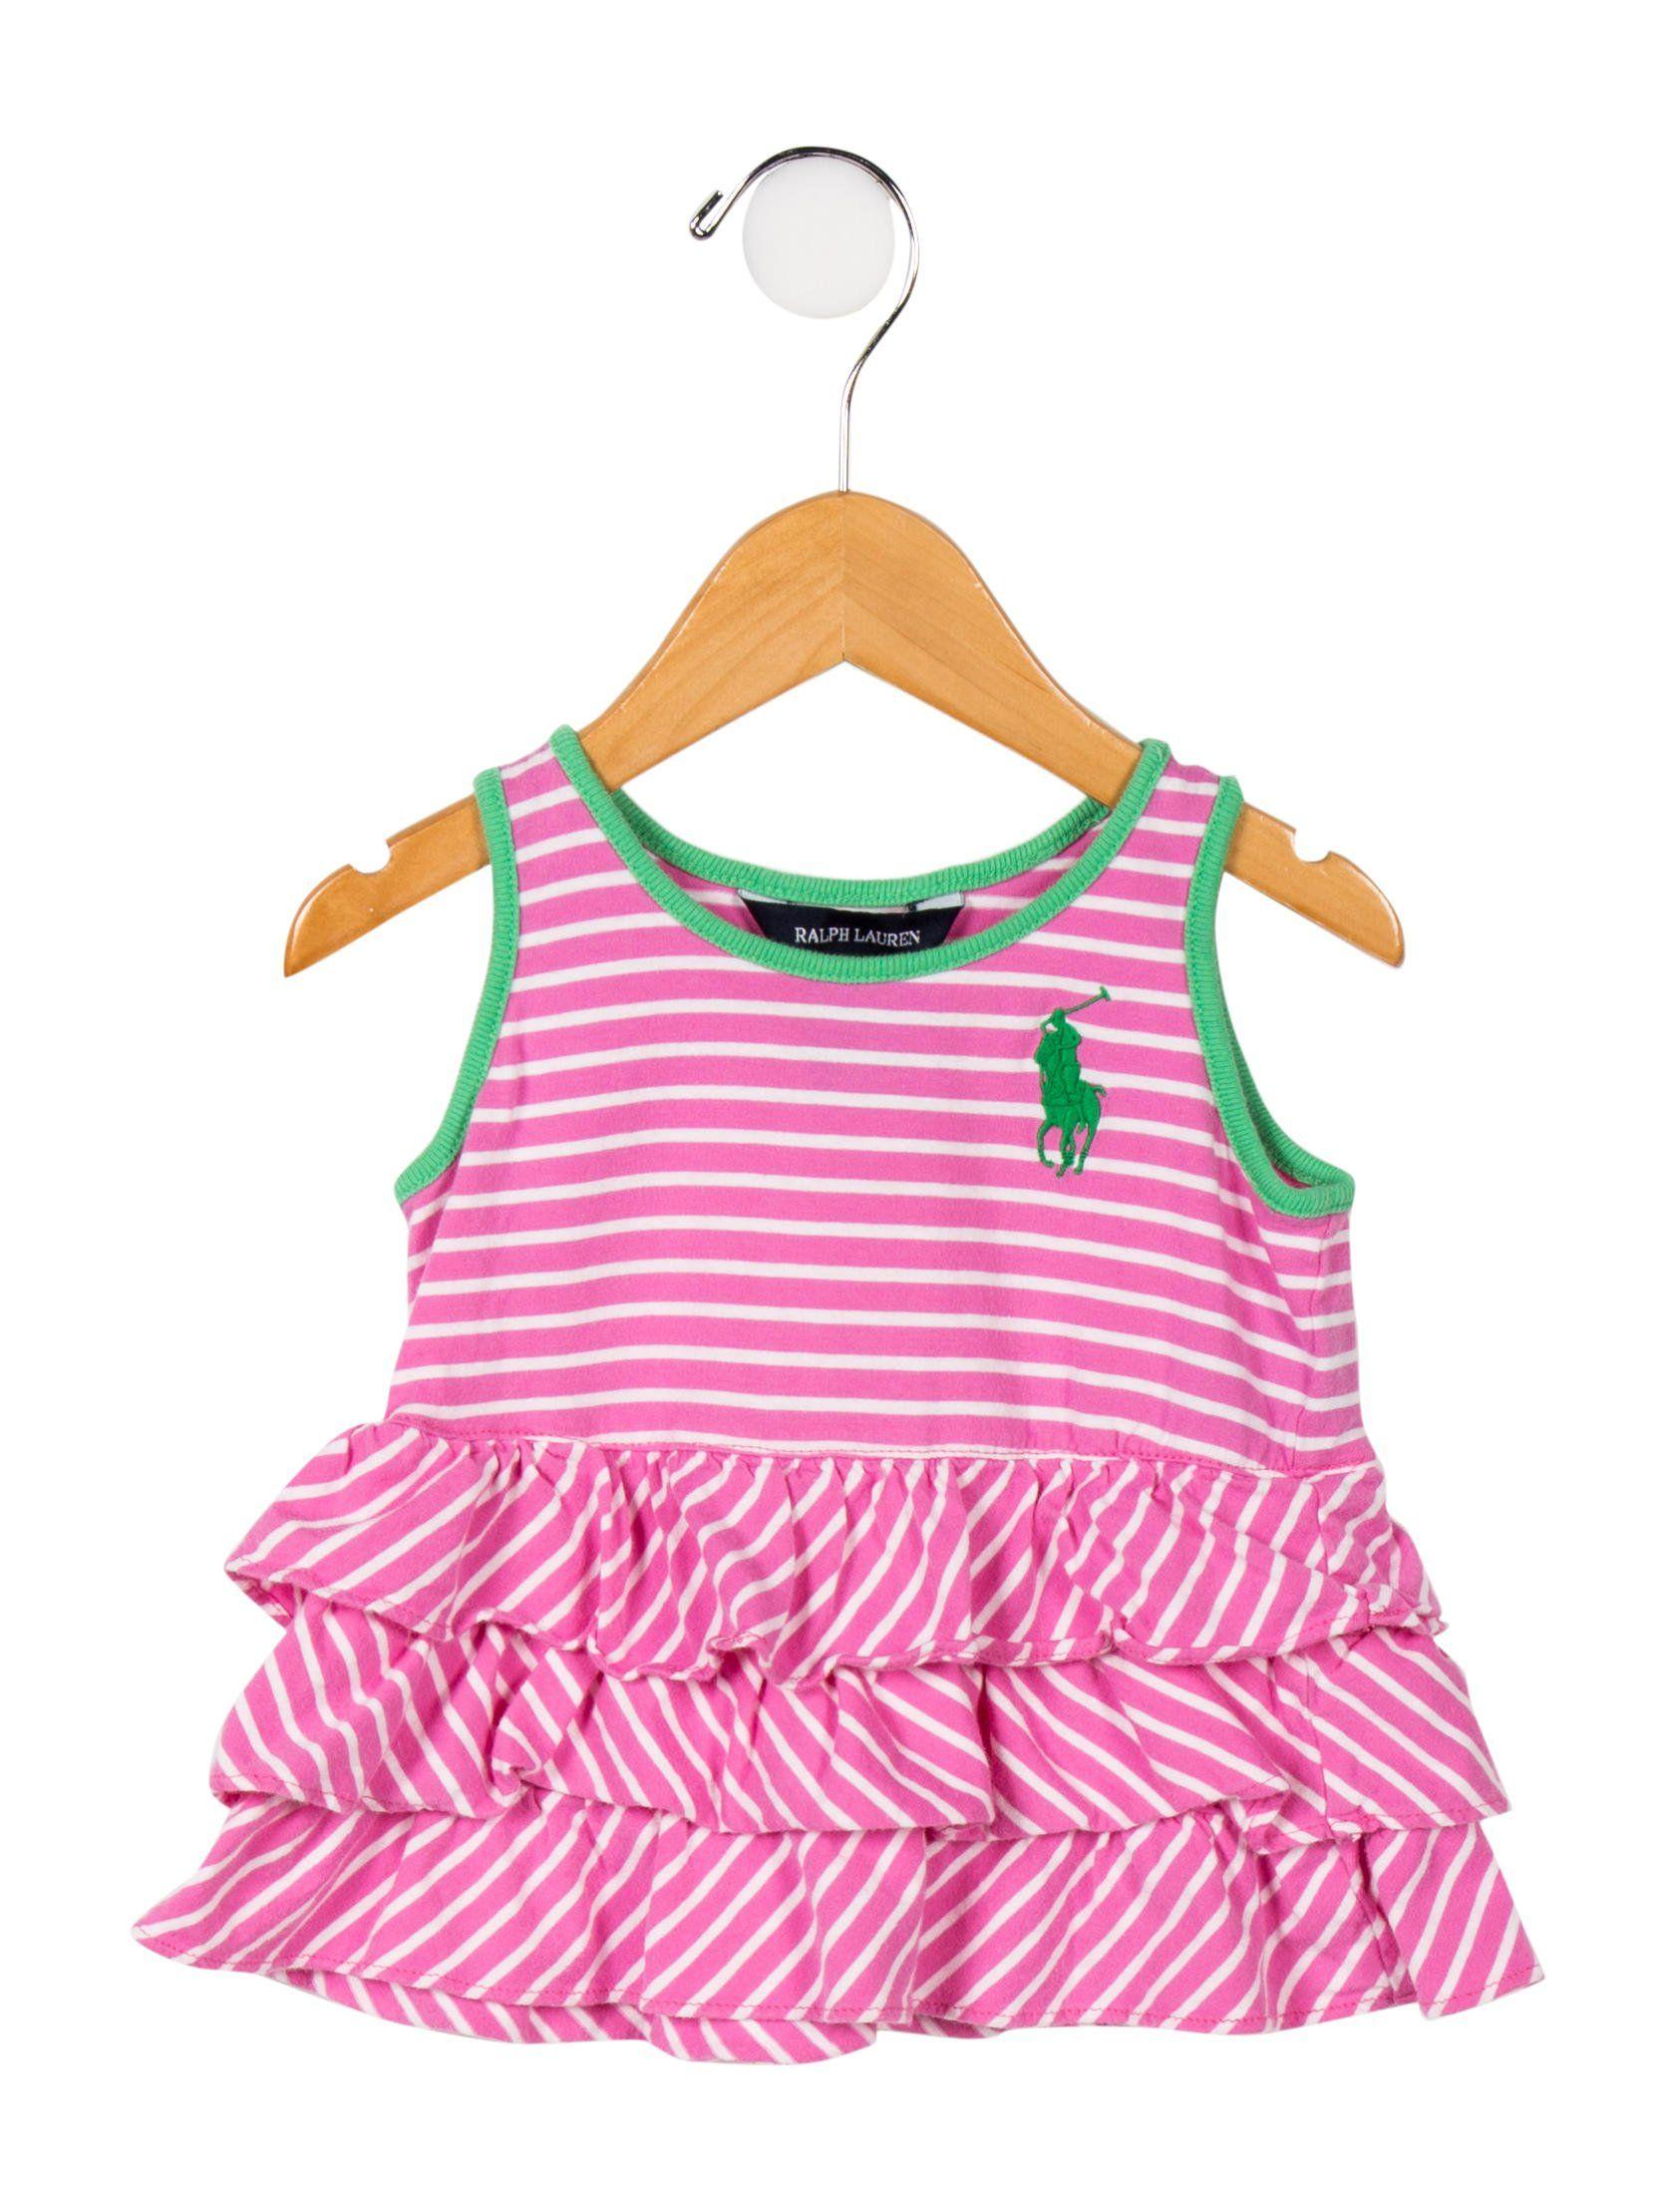 26baad70339 Girls  Sleeveless Stripe Top